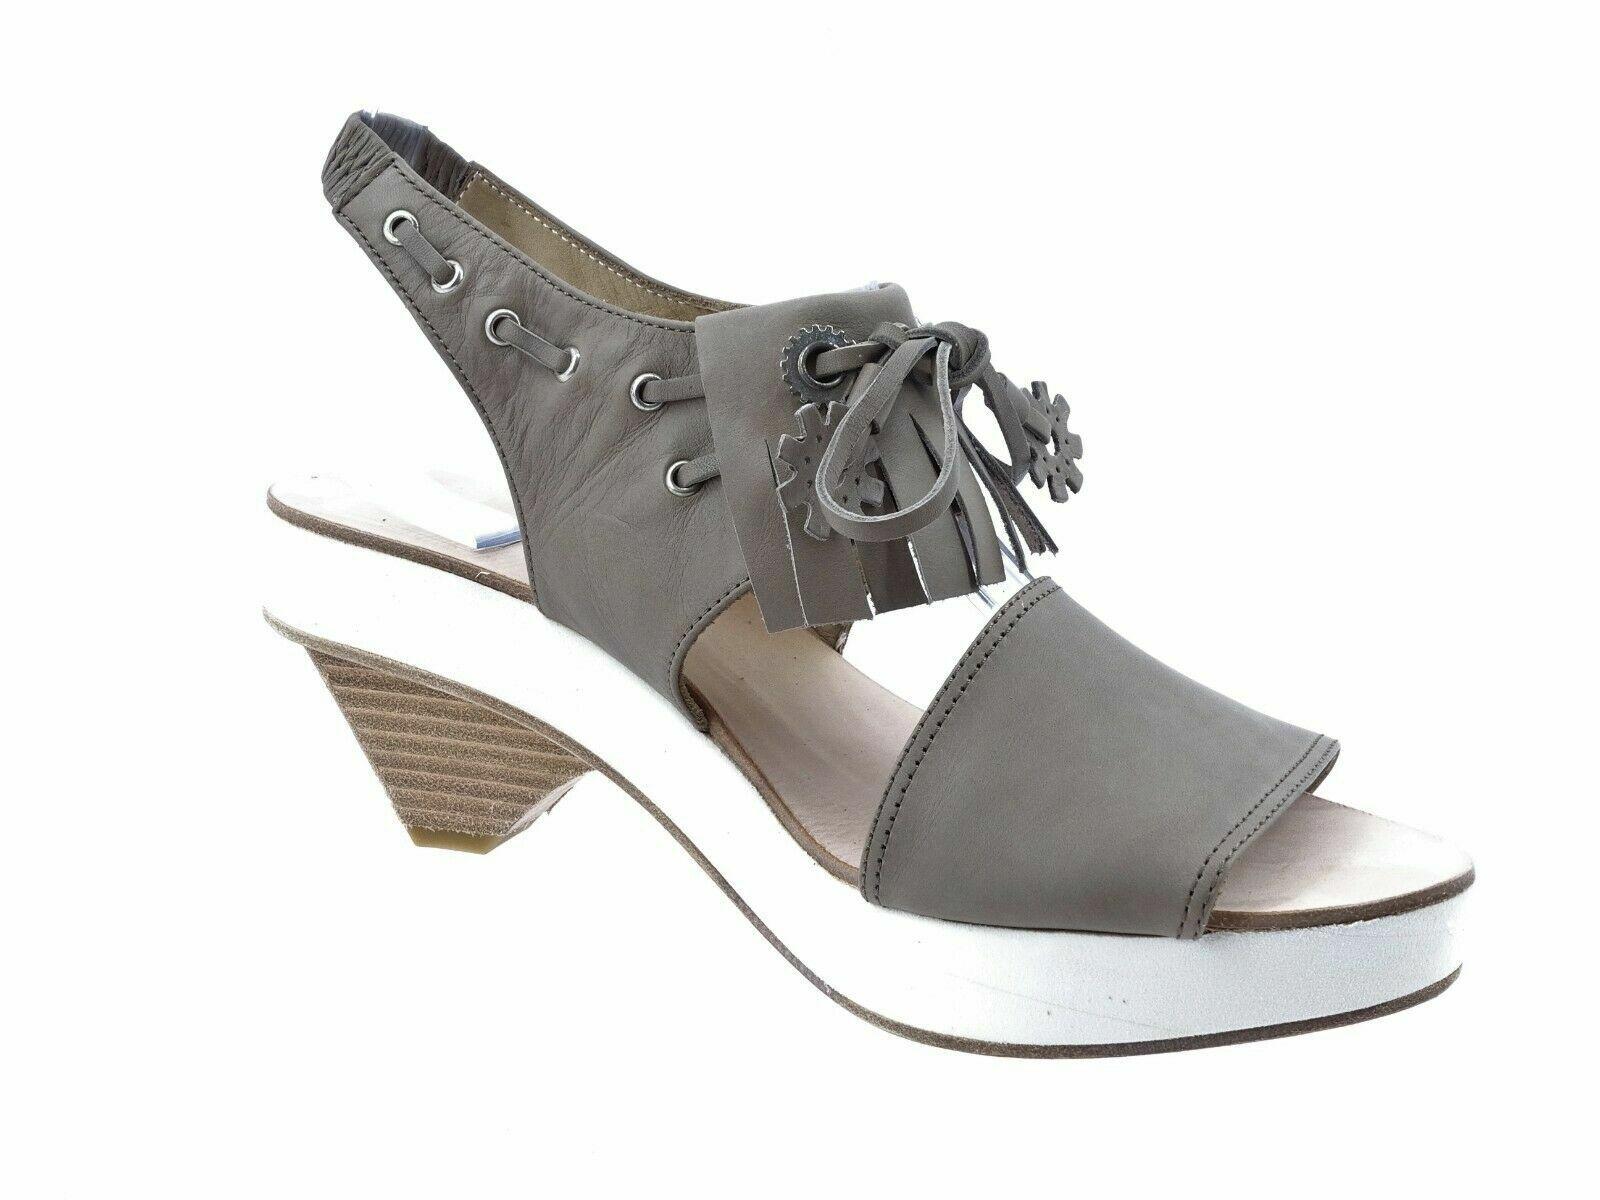 Marithe Francois Girbaud Schuhe Damen Sandalen Sandalen Sandalen Sandalette Sommerschuhe 37 Leder cc36fd